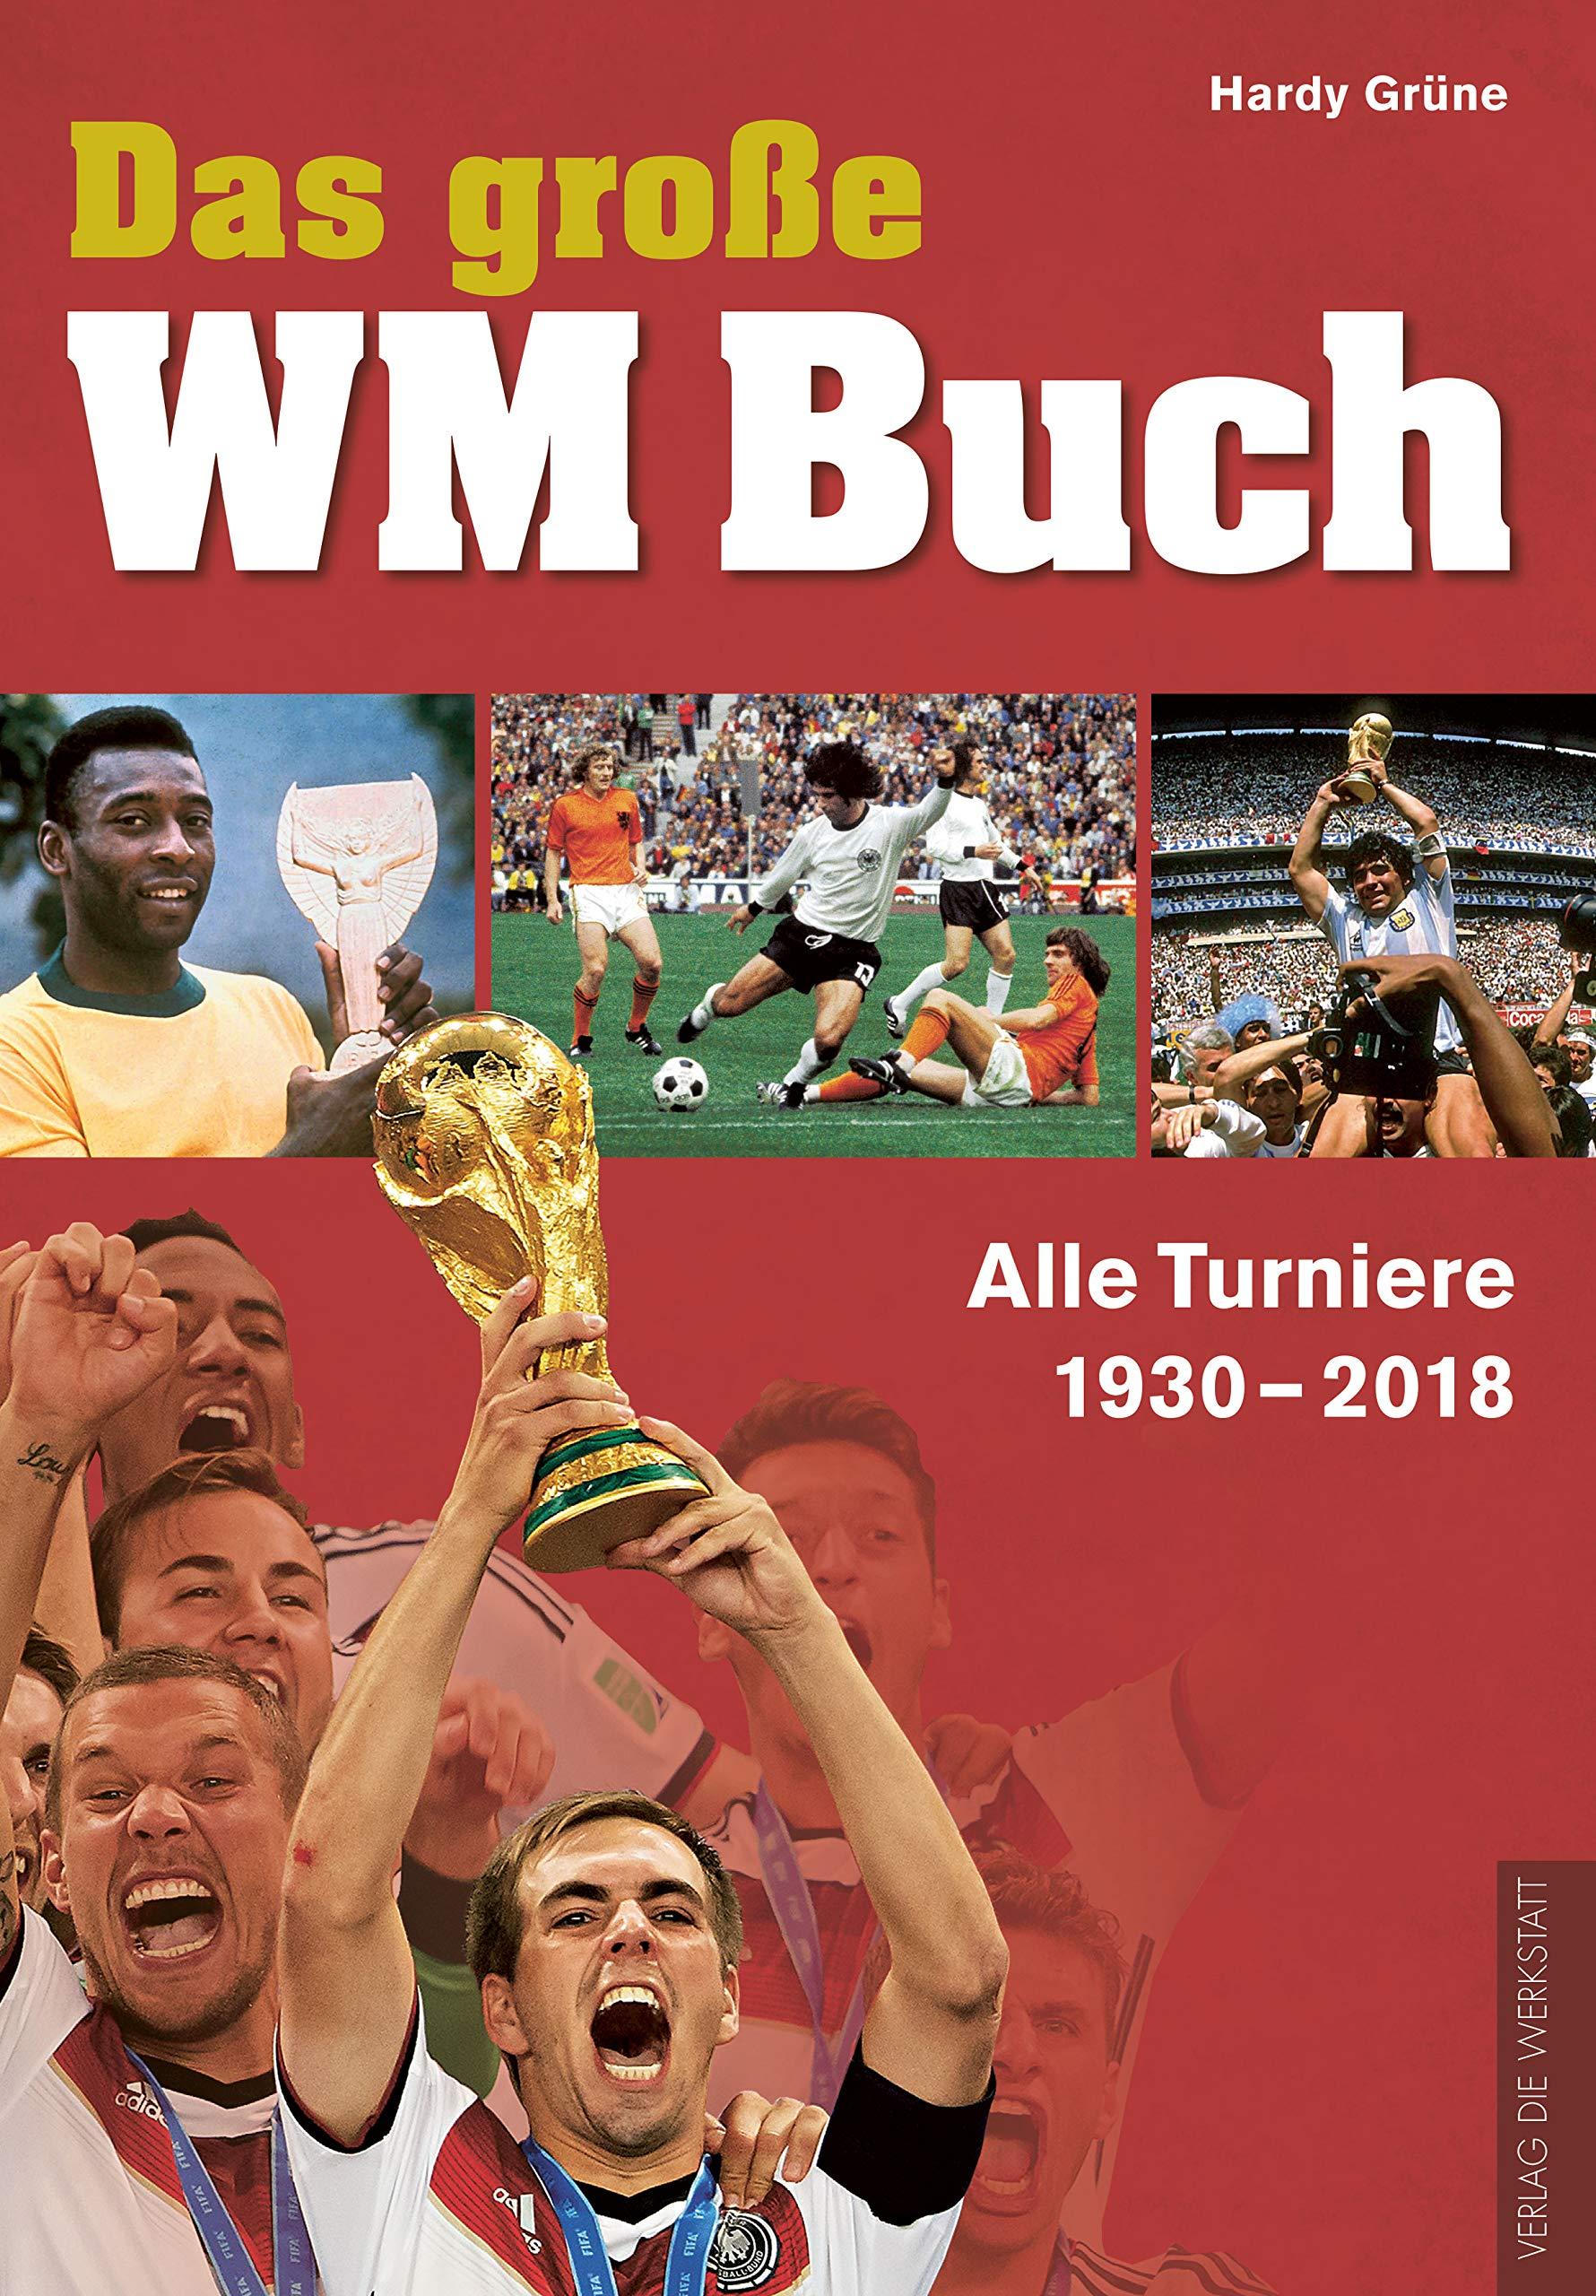 Das Grosse Wm Buch Alle Turniere 1930 2018 Amazon De Hardy